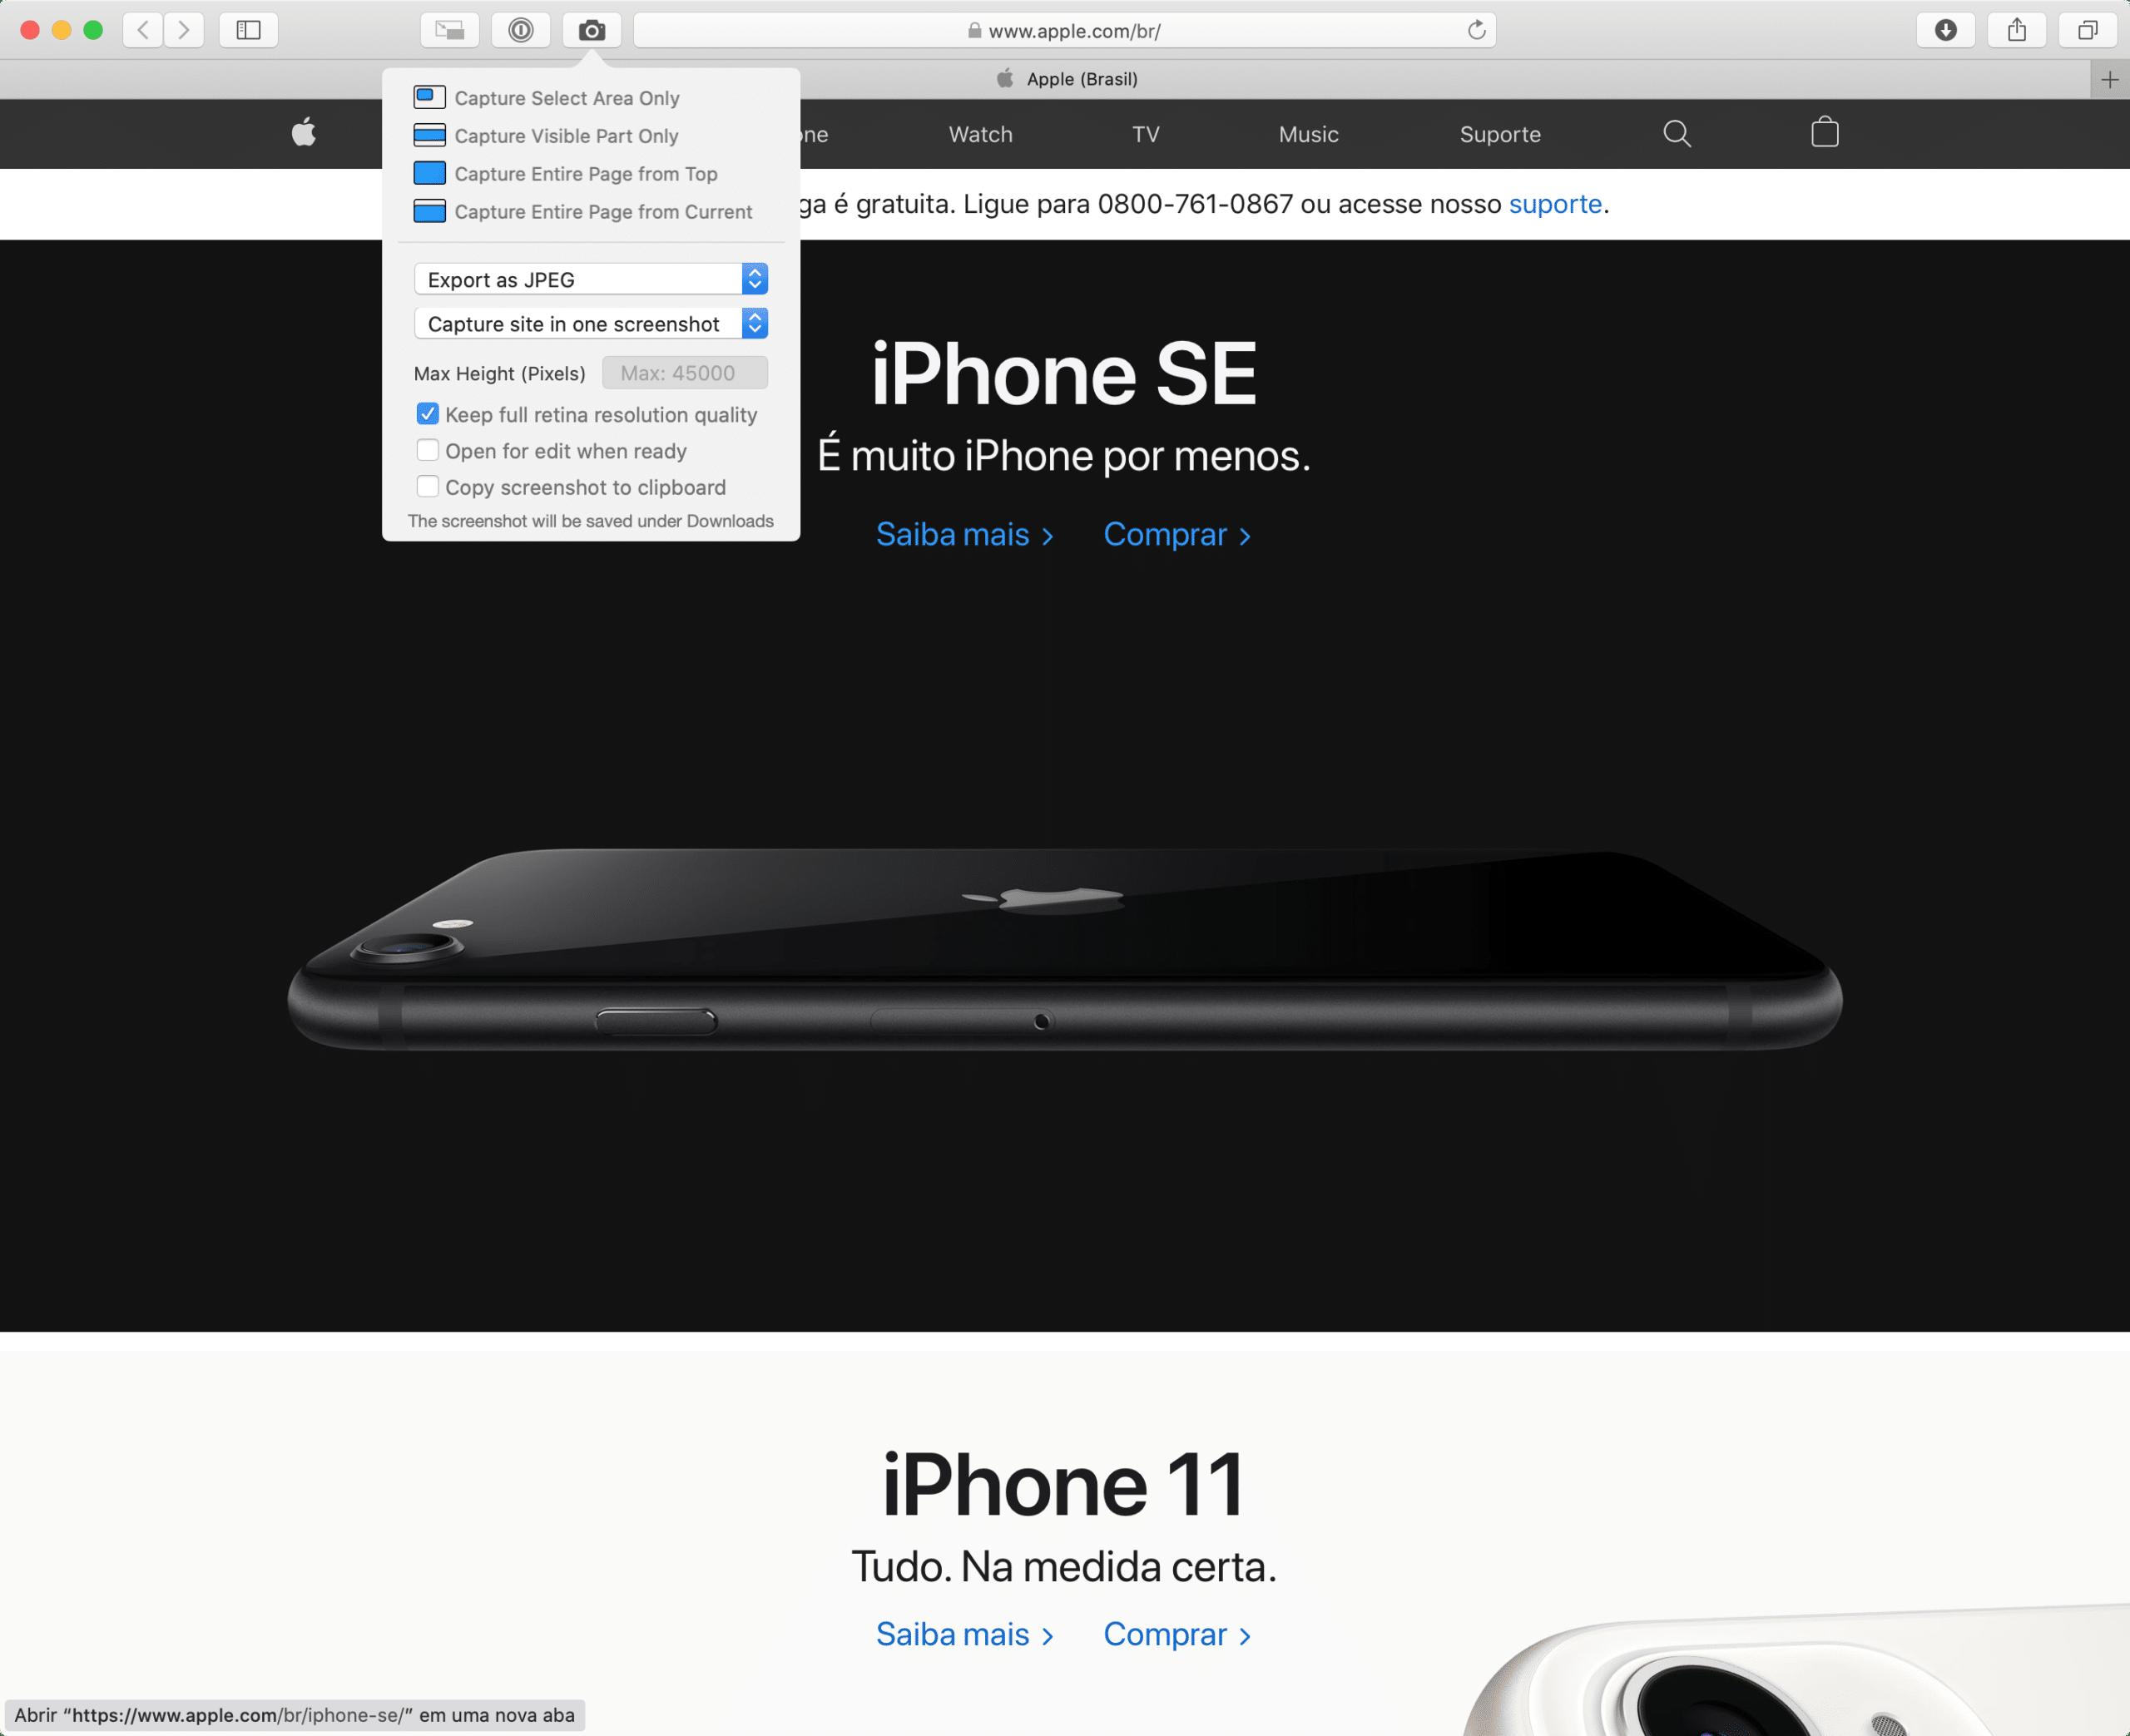 Page Screenshot for Safari